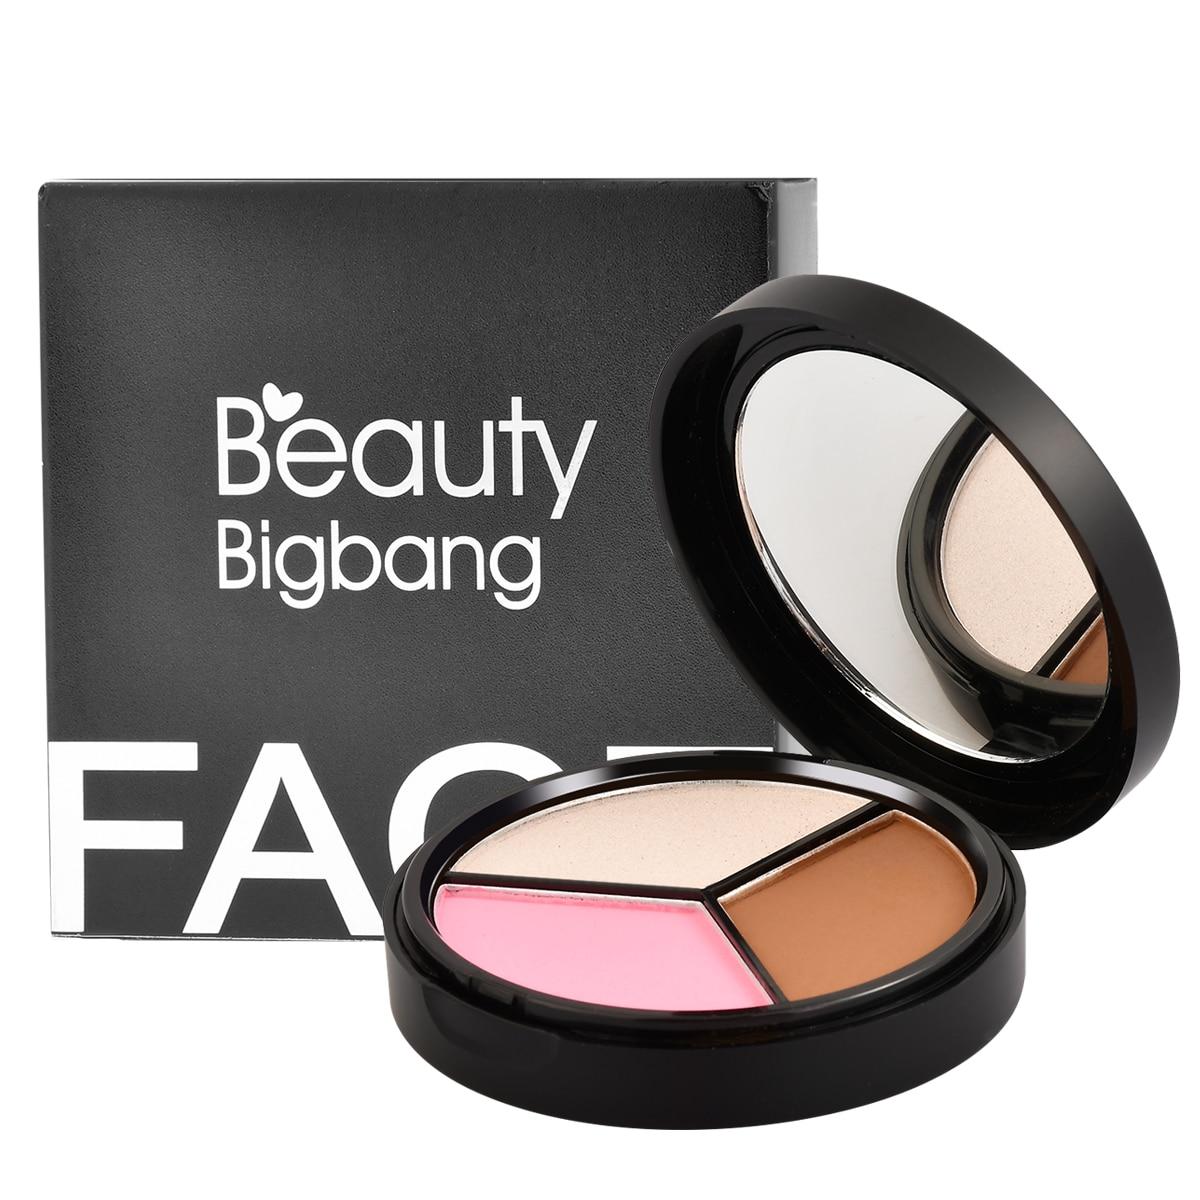 BeautyBigBang 3 Farben Textmarker Iluminador Gesicht Pulver Bronzer Make-Up Rouge Schimmer Bronzer High Palette Kontur